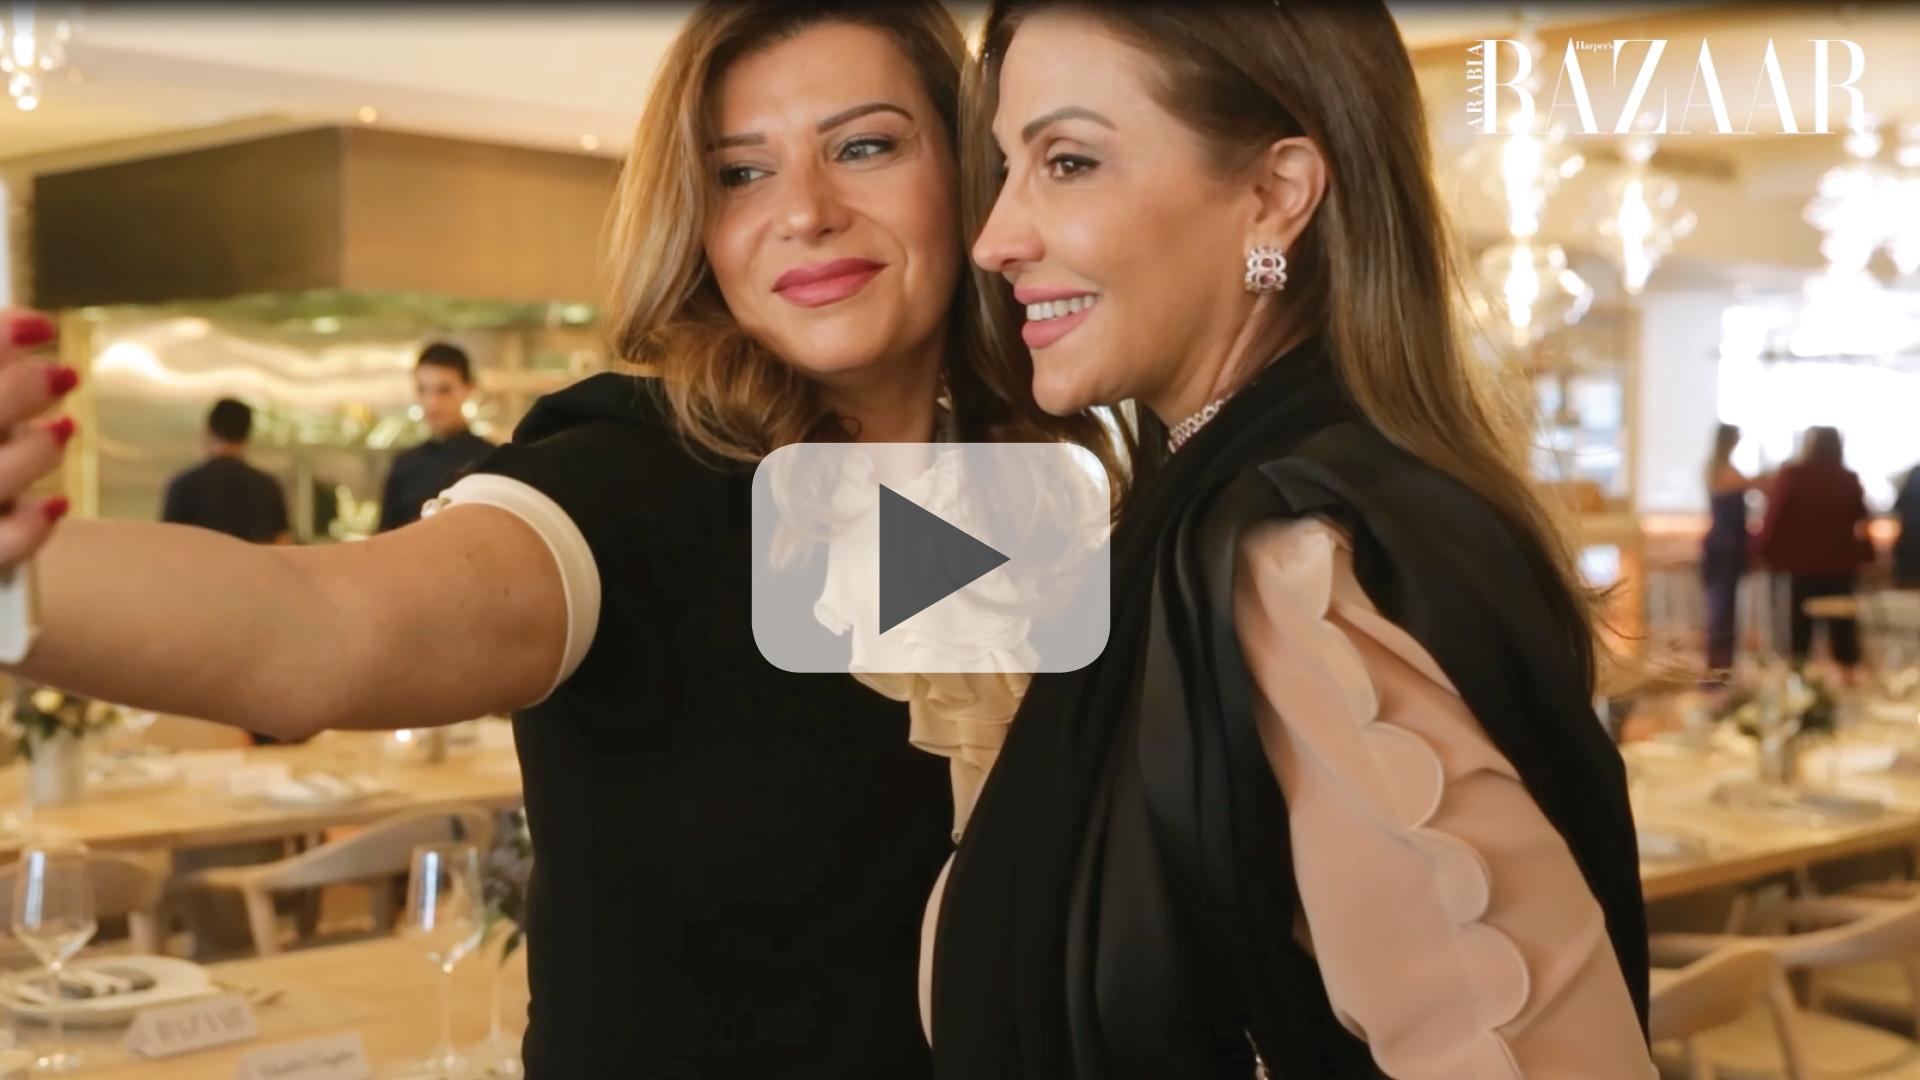 Watch: Harper's Bazaar Arabia's VIP Lunch To Celebrate Female Achievement